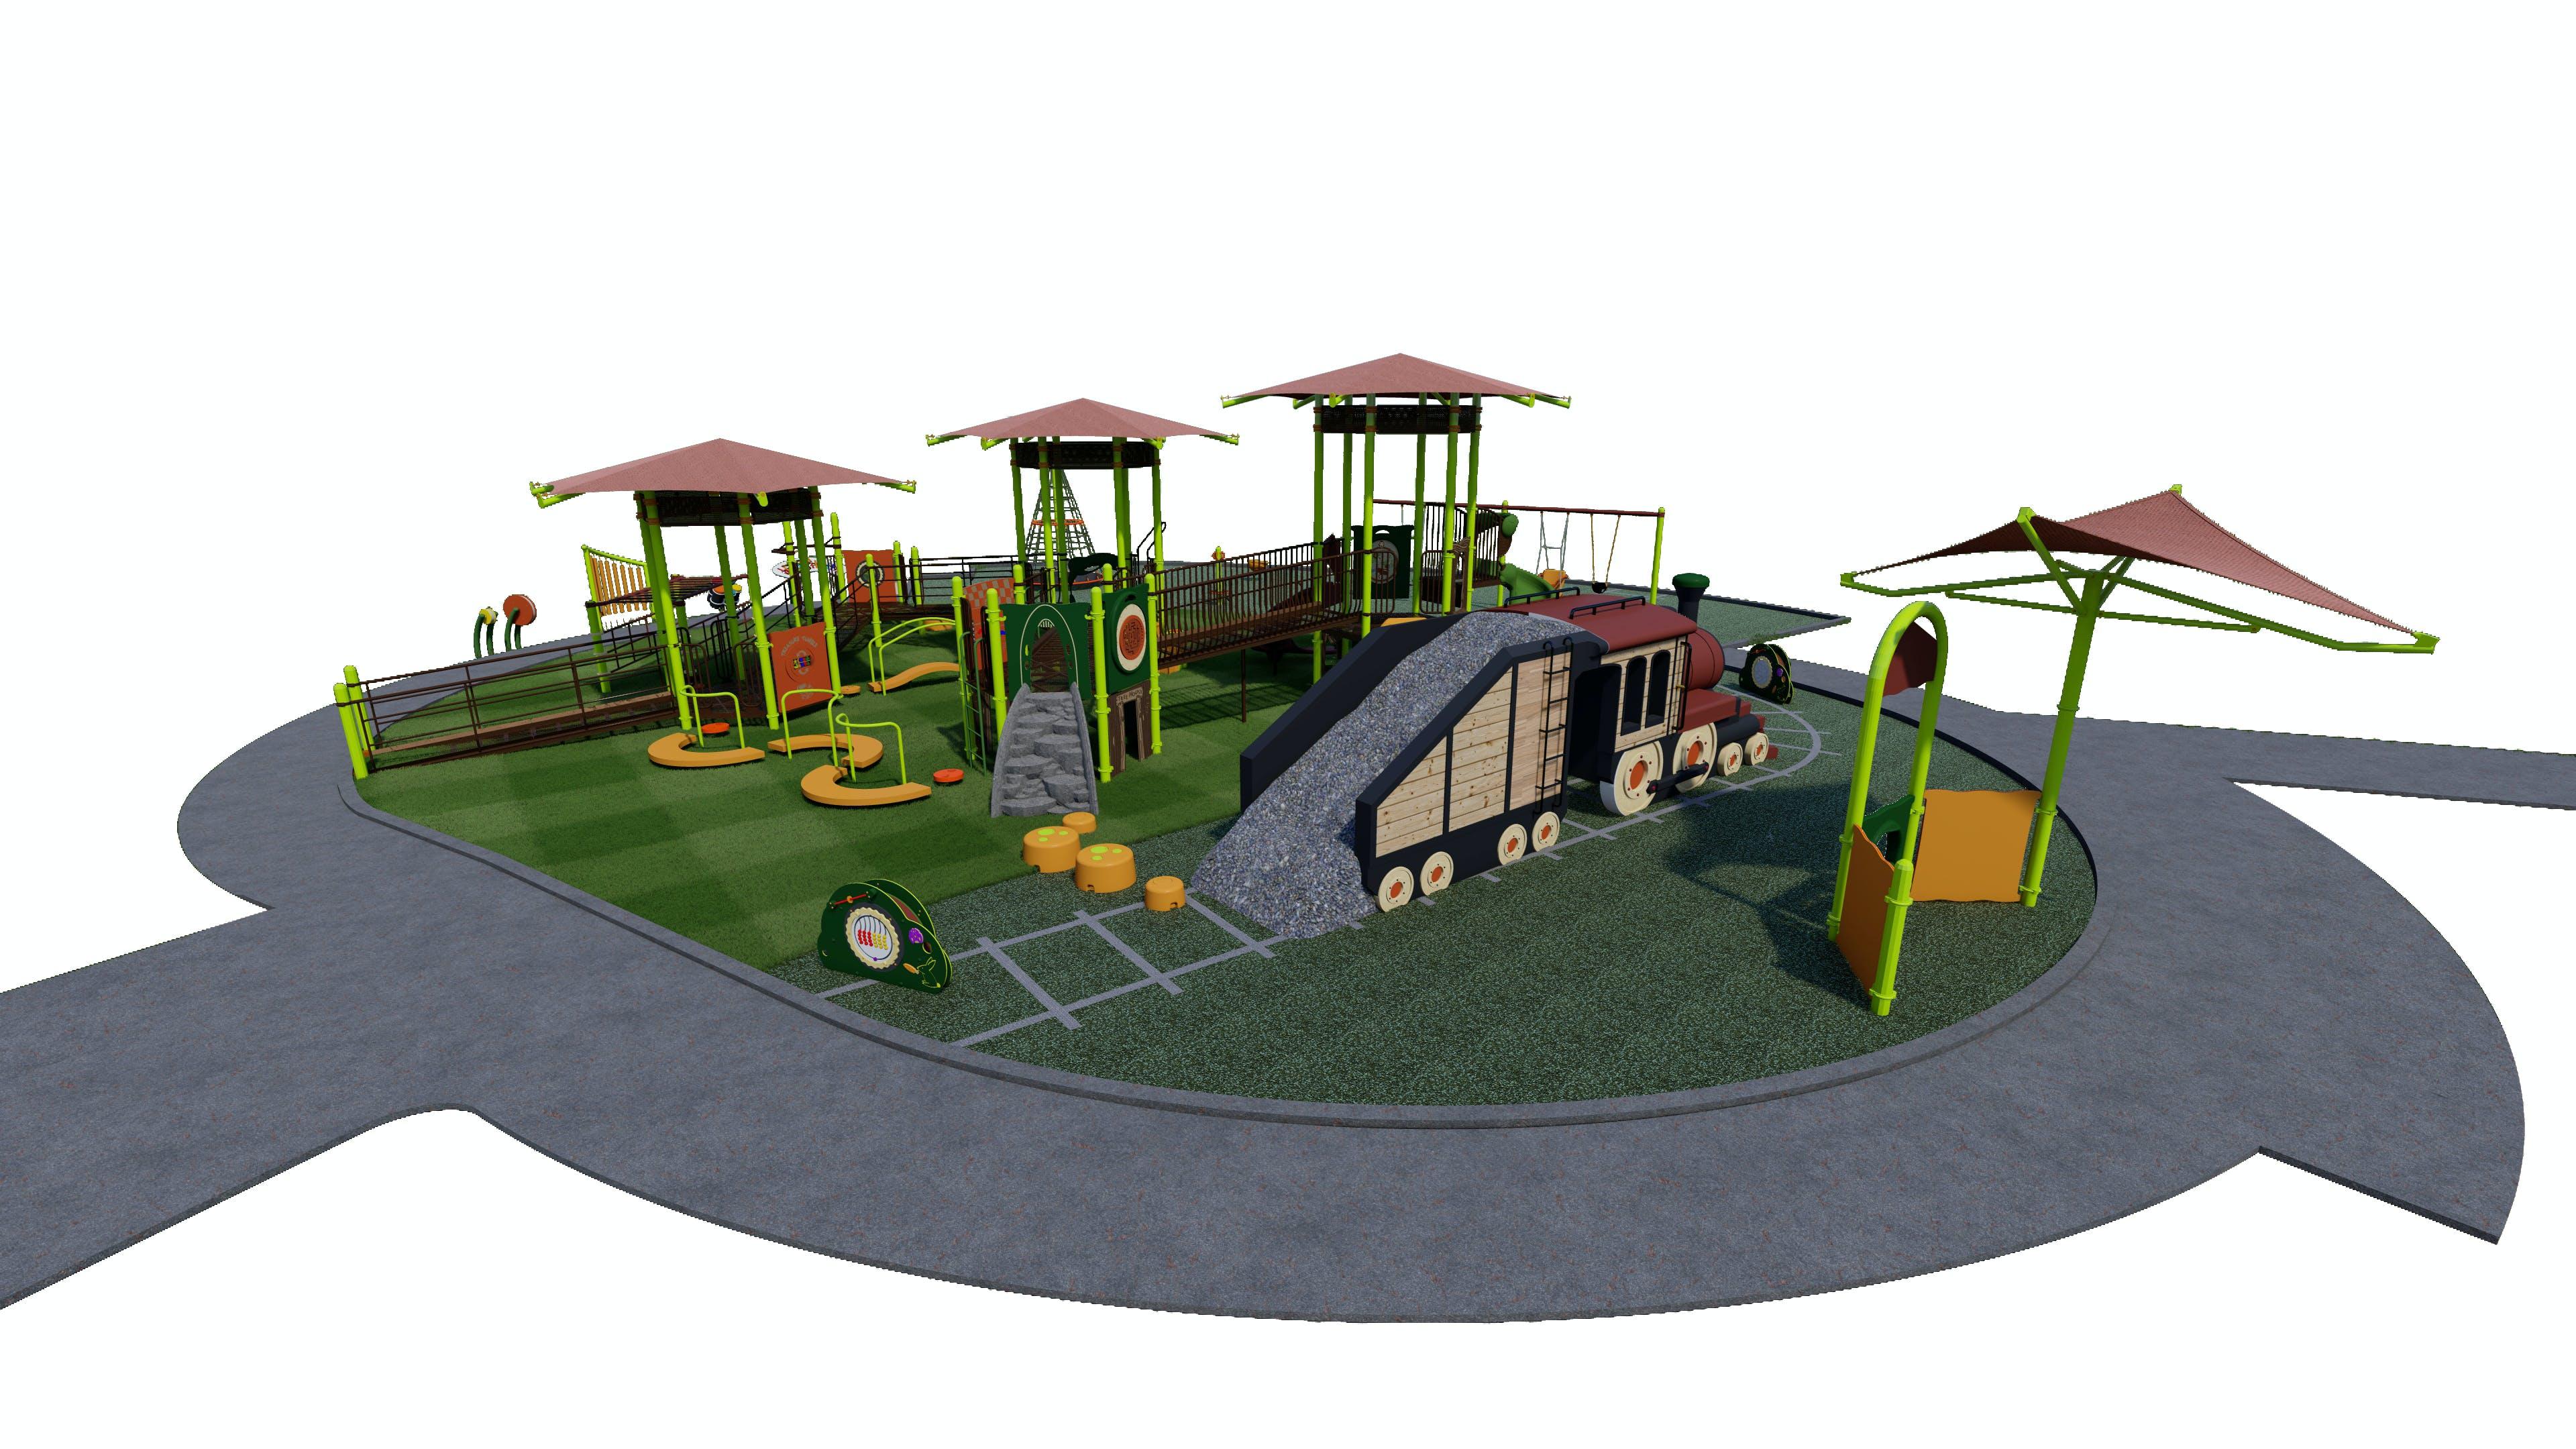 Preferred Playground Design View 1